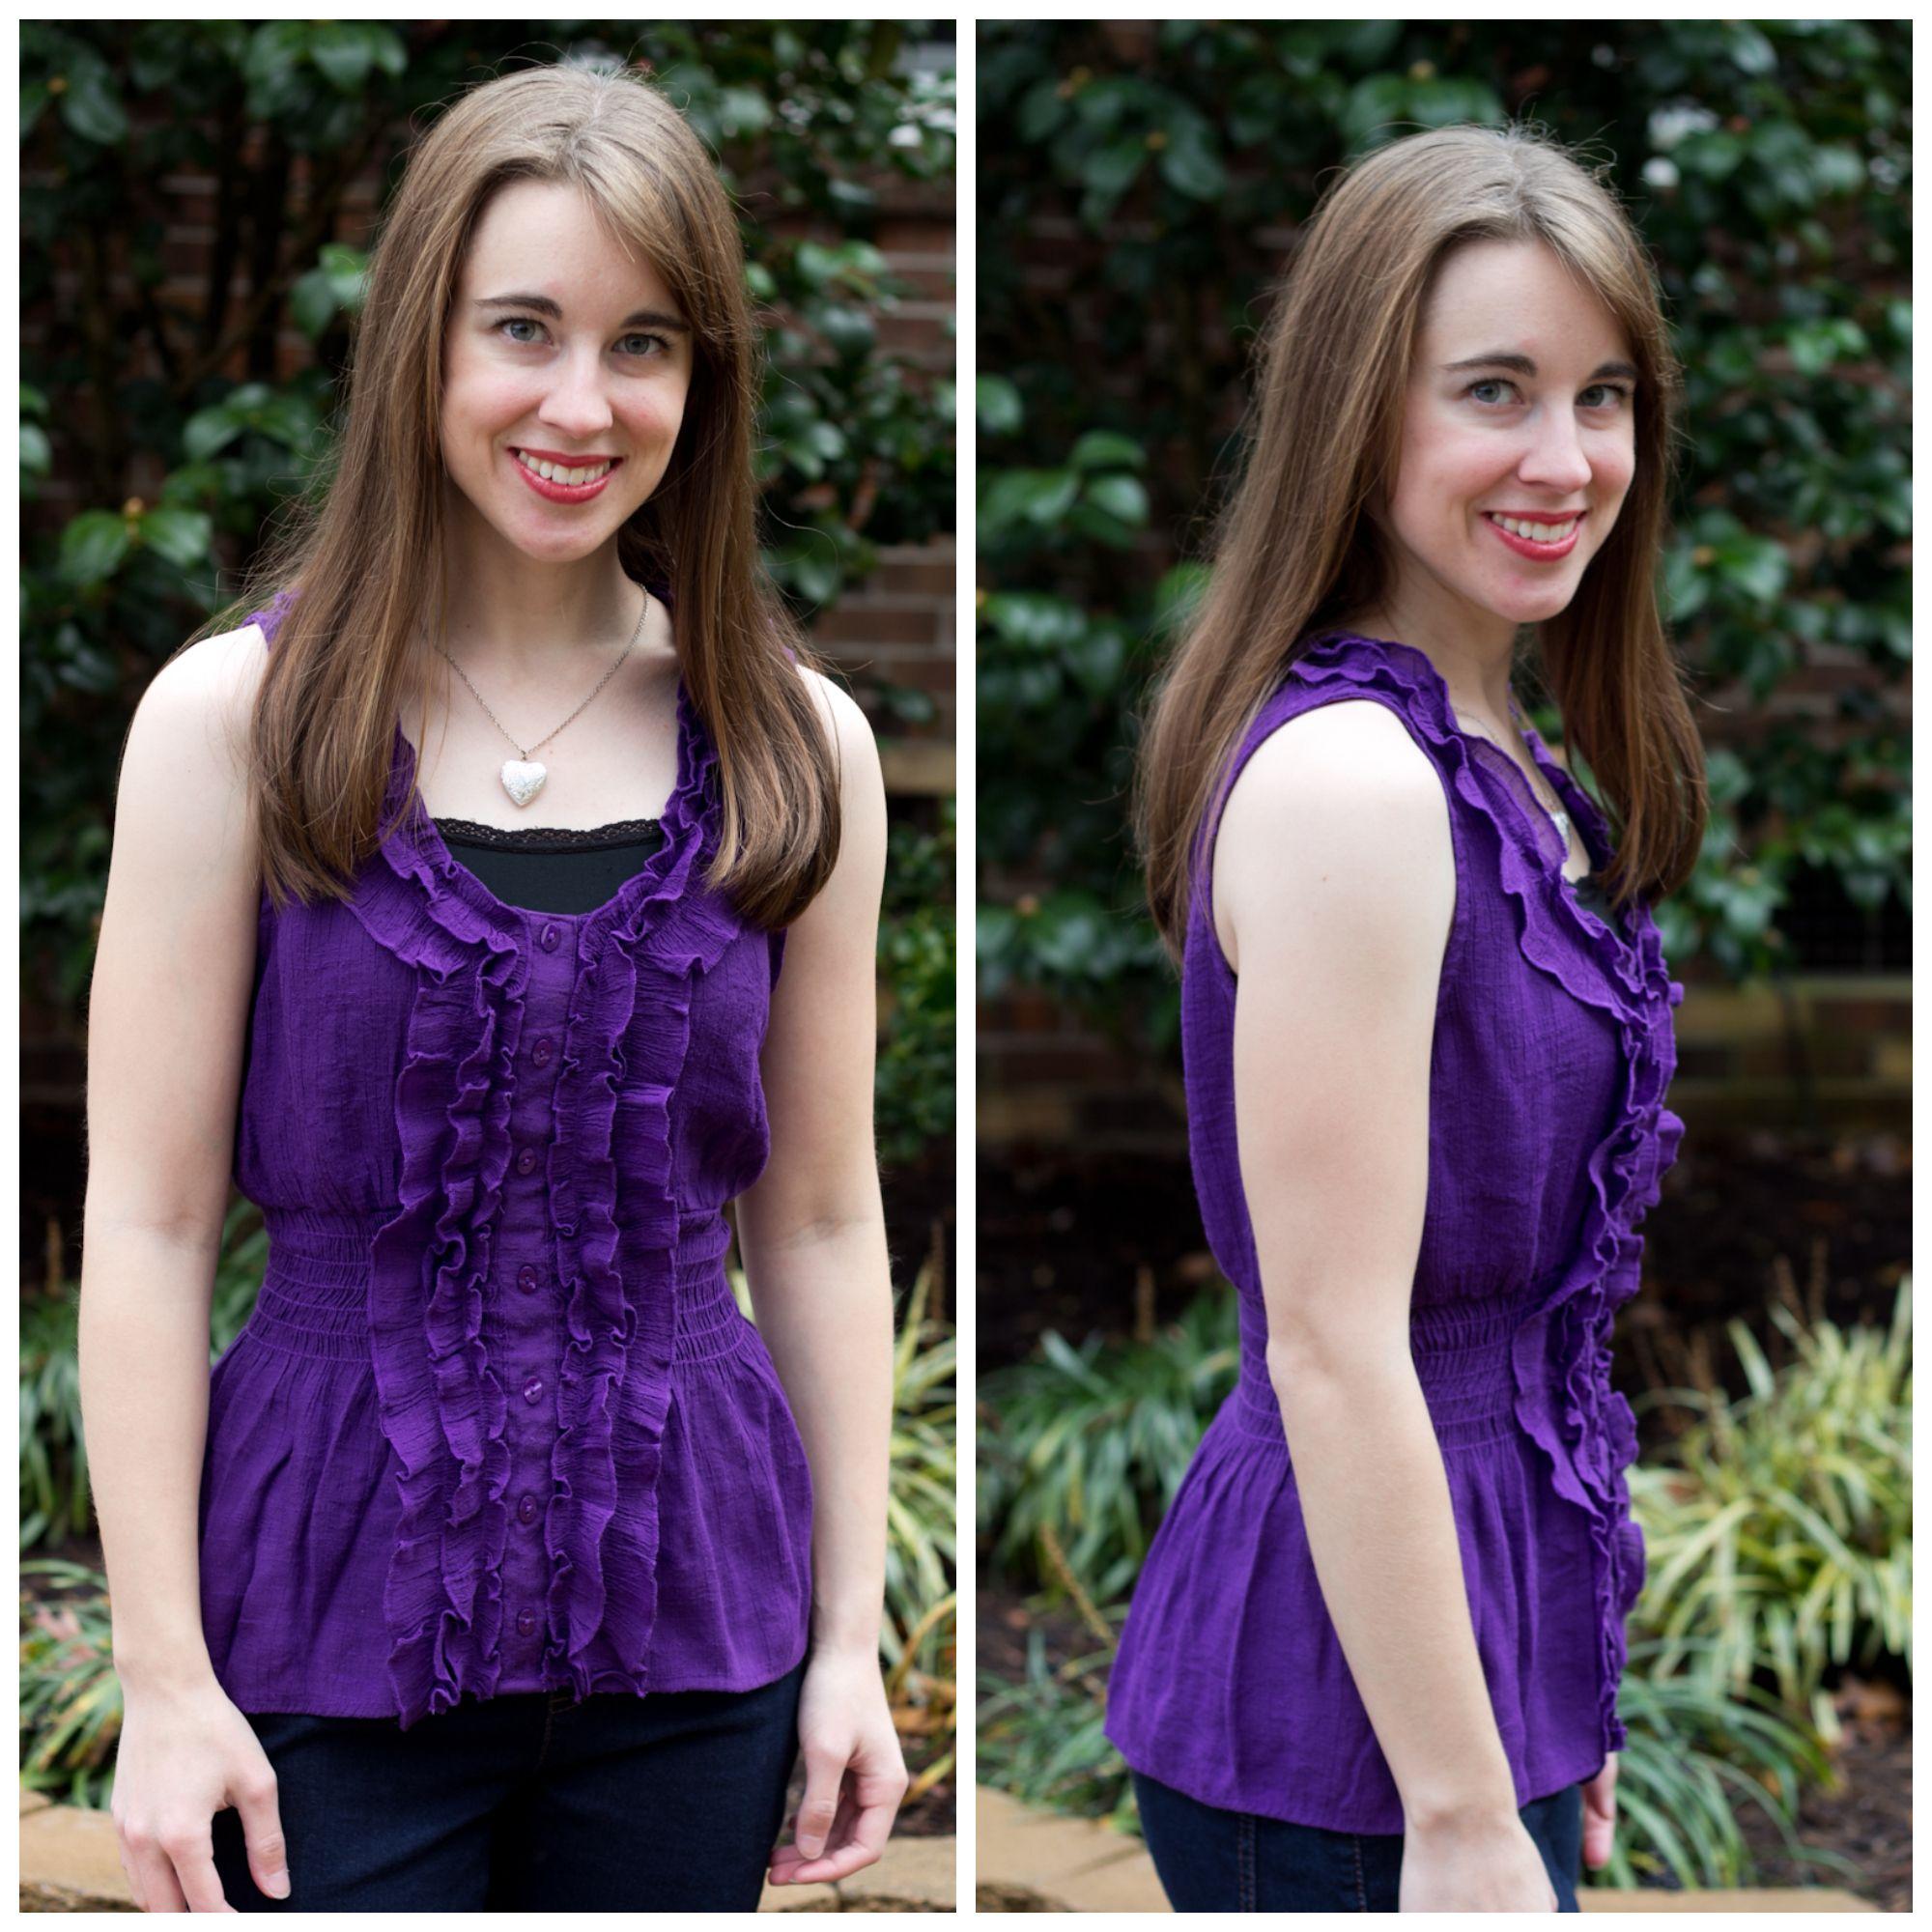 Purple frilly sleeveless shirt